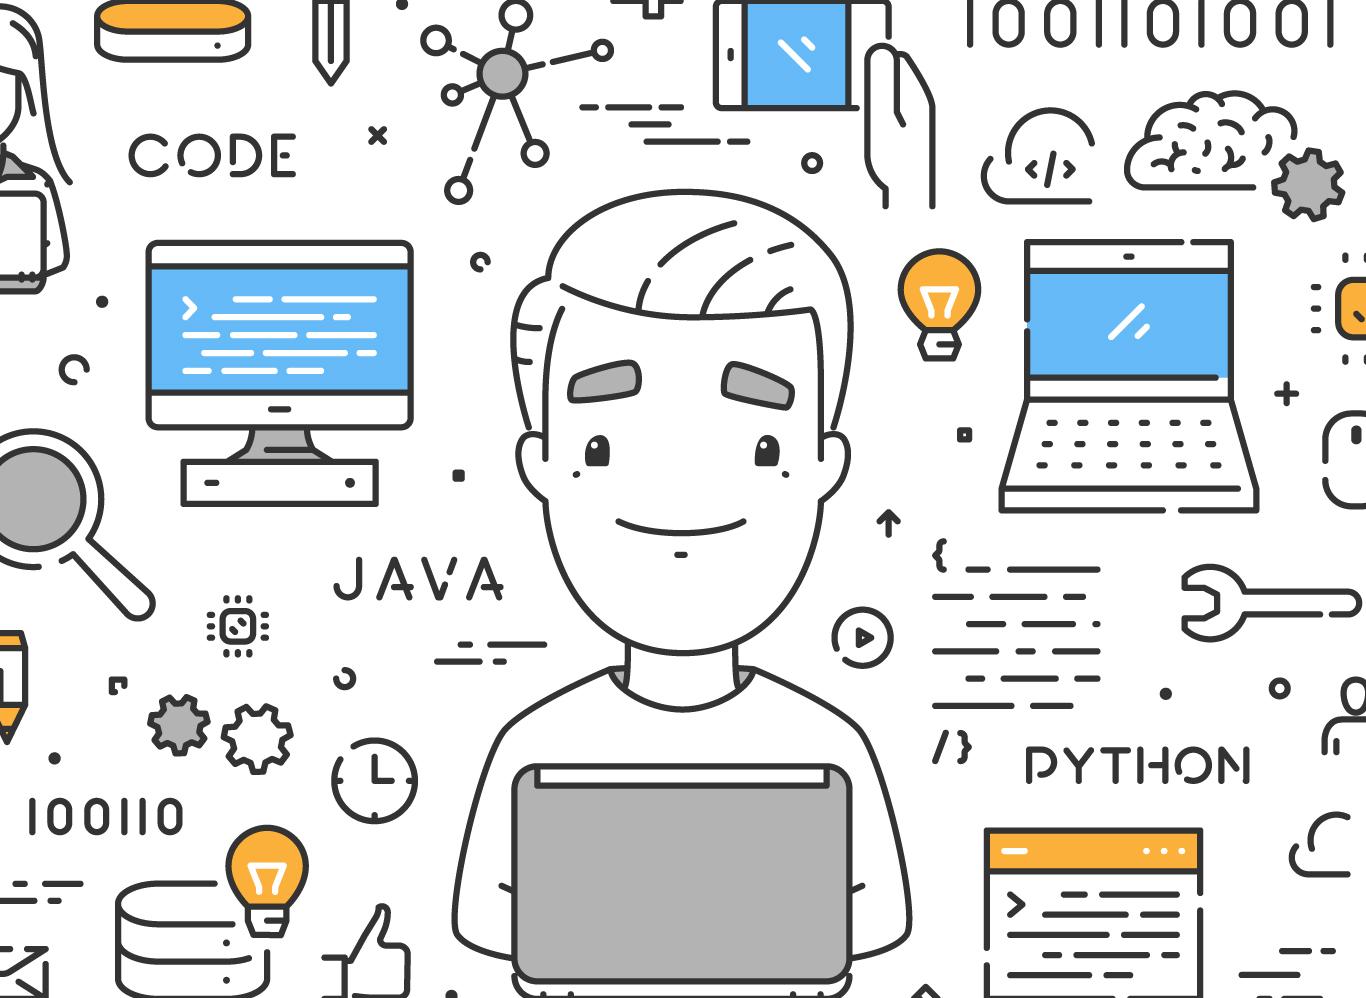 Coding-languages-1366-1118